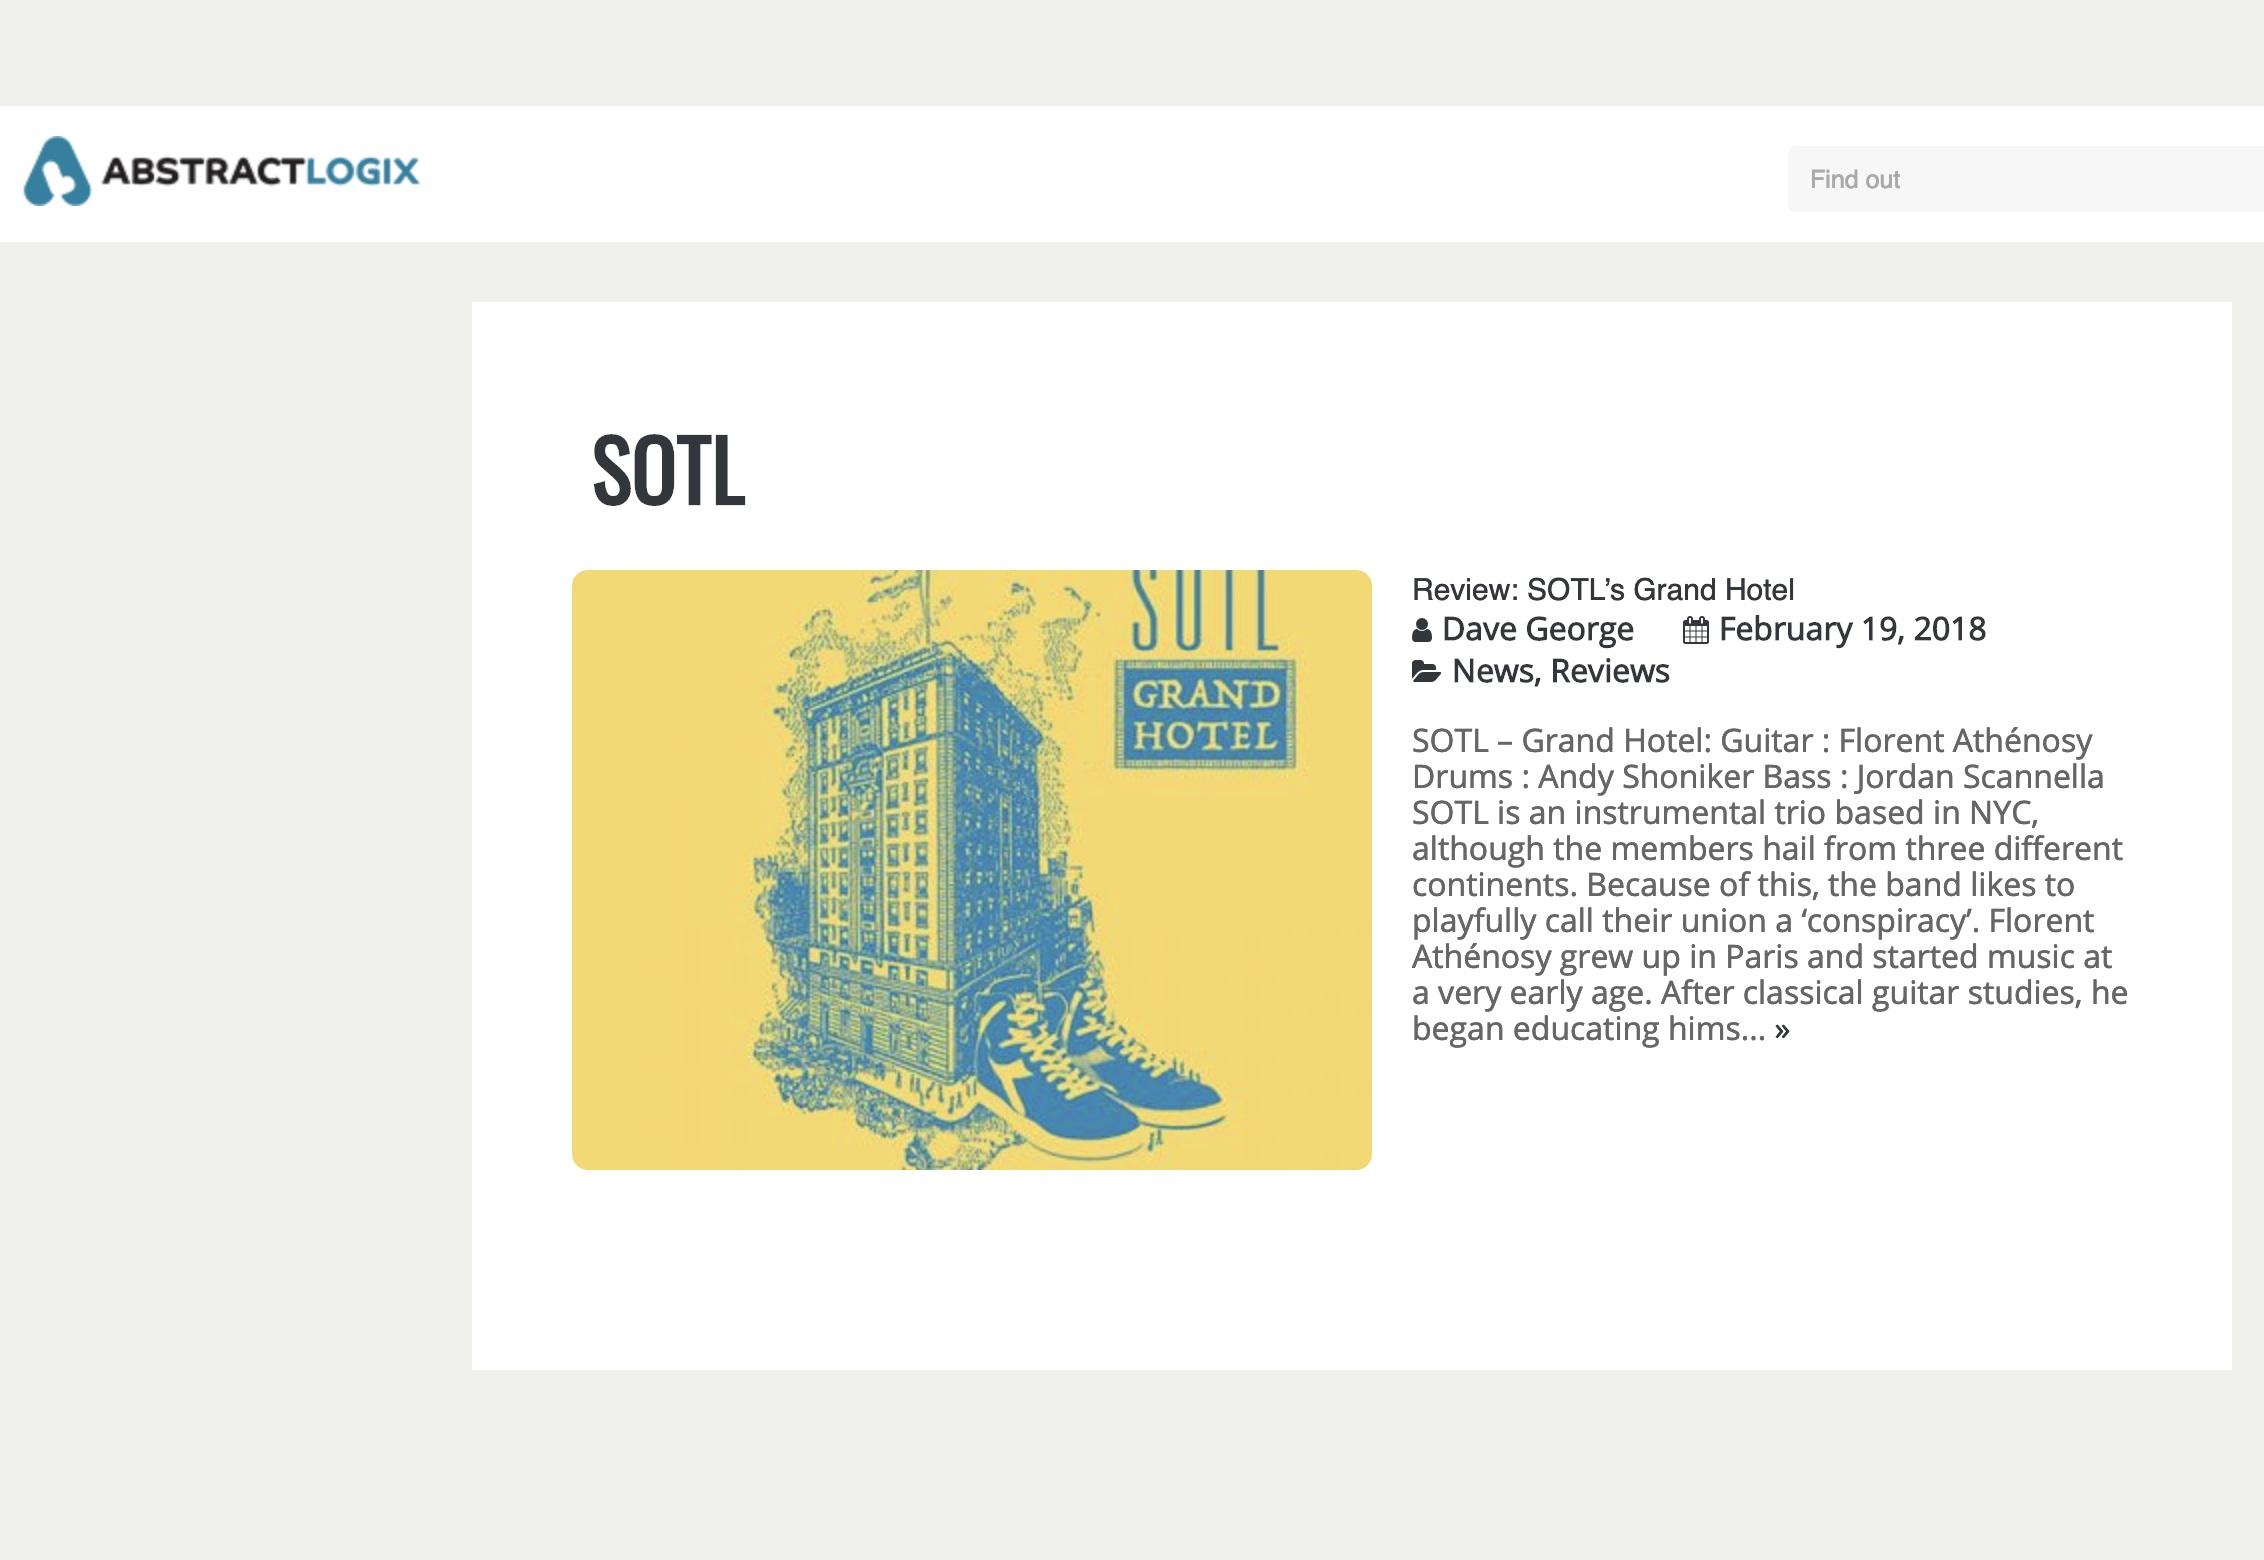 SOTL+Abstract+Logix+Review+1.jpg